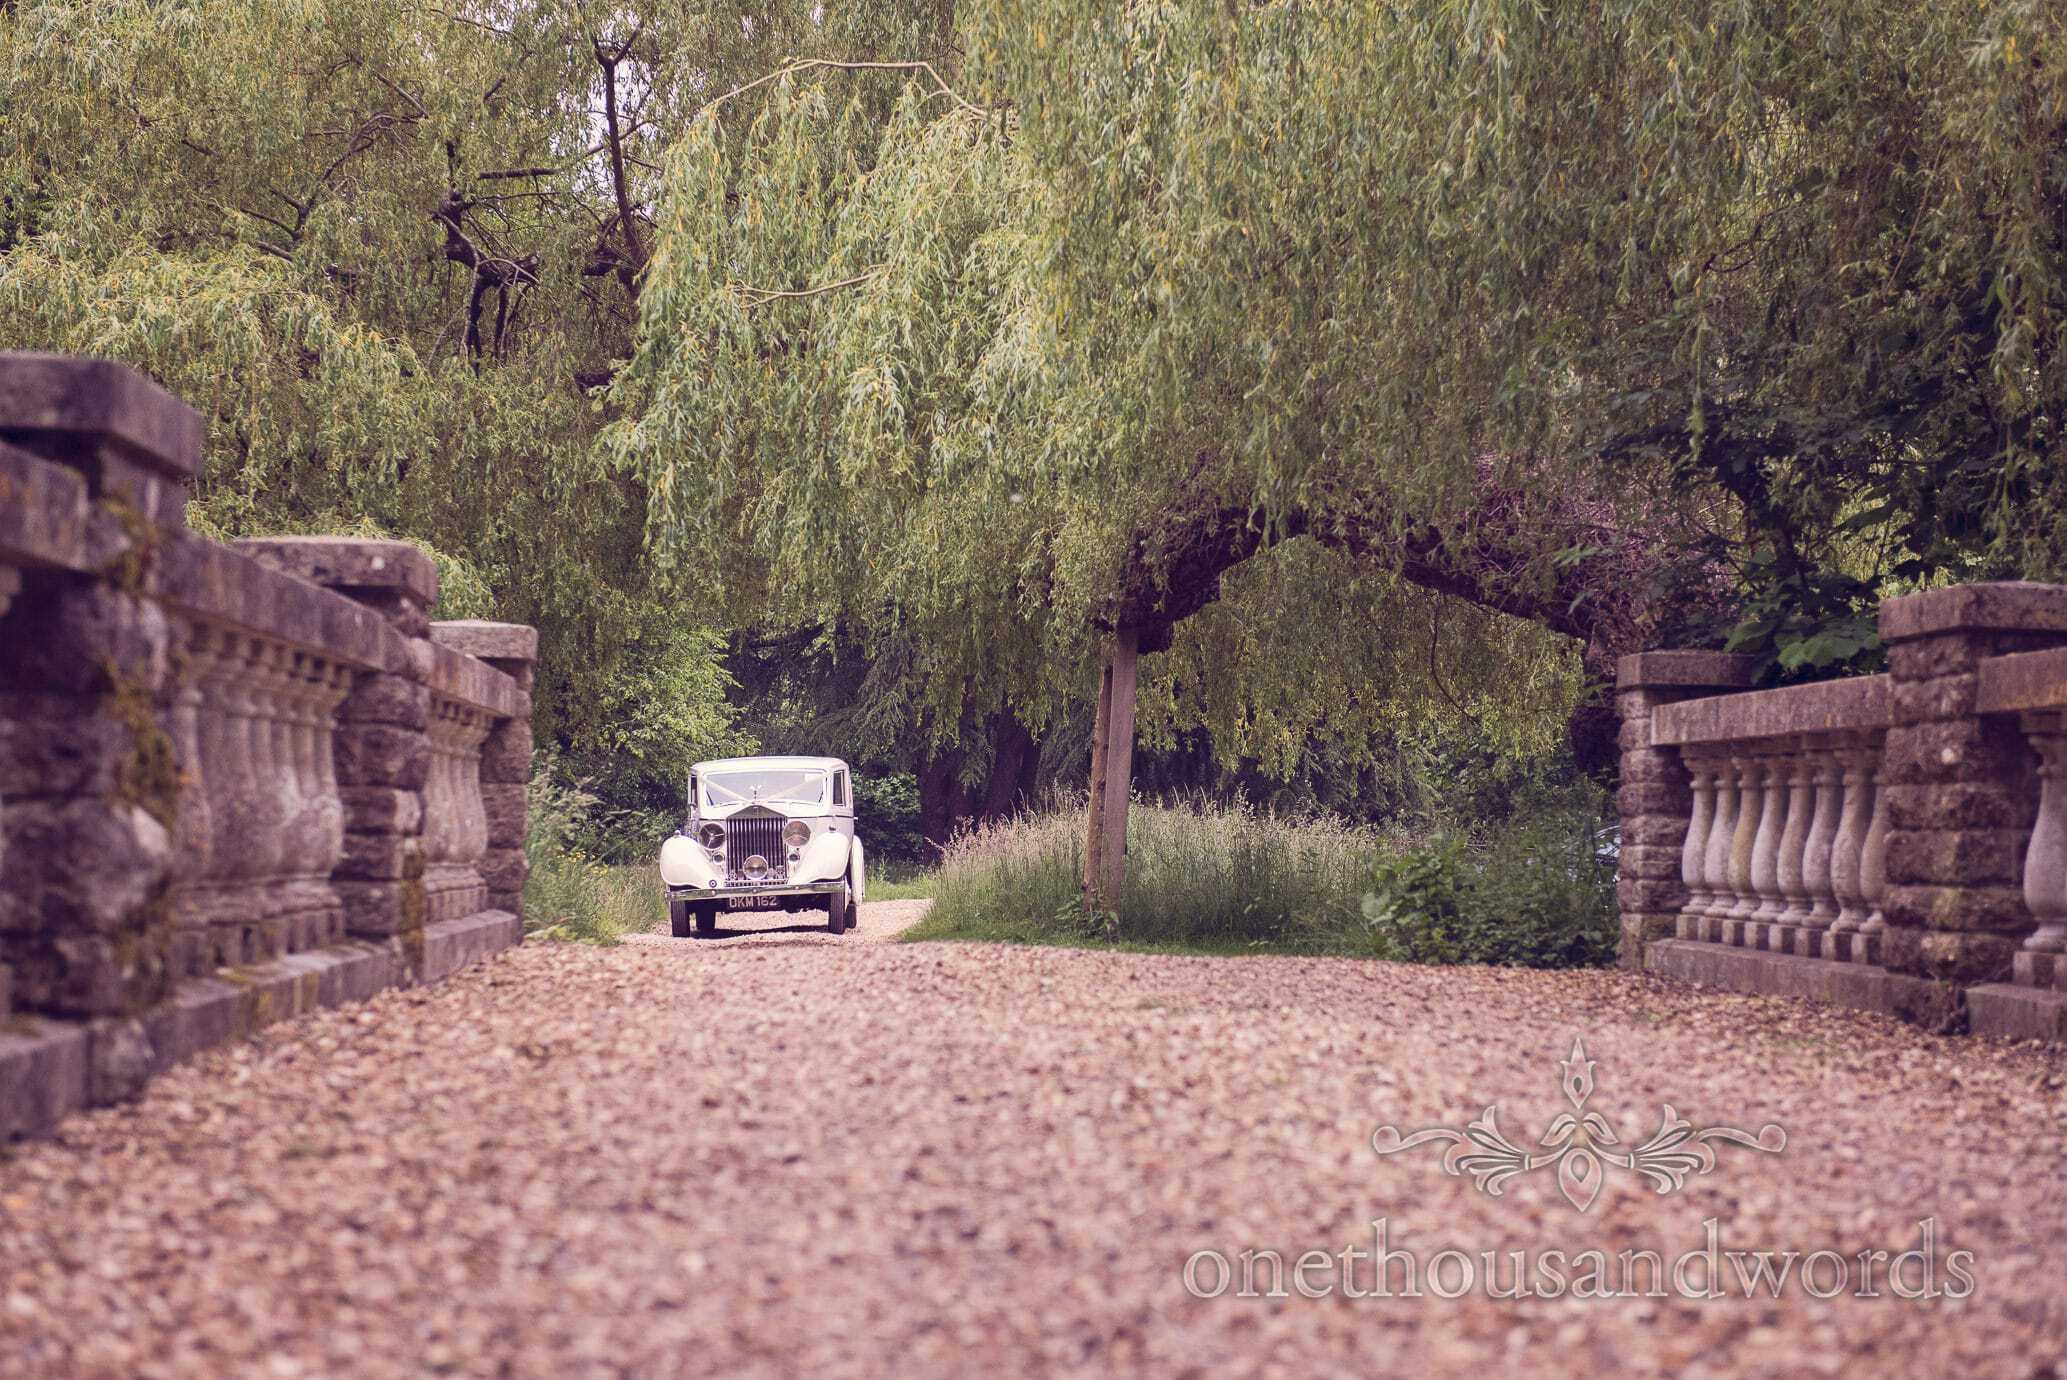 Classic Rolls Royce wedding car arrives at Deans Court Wedding